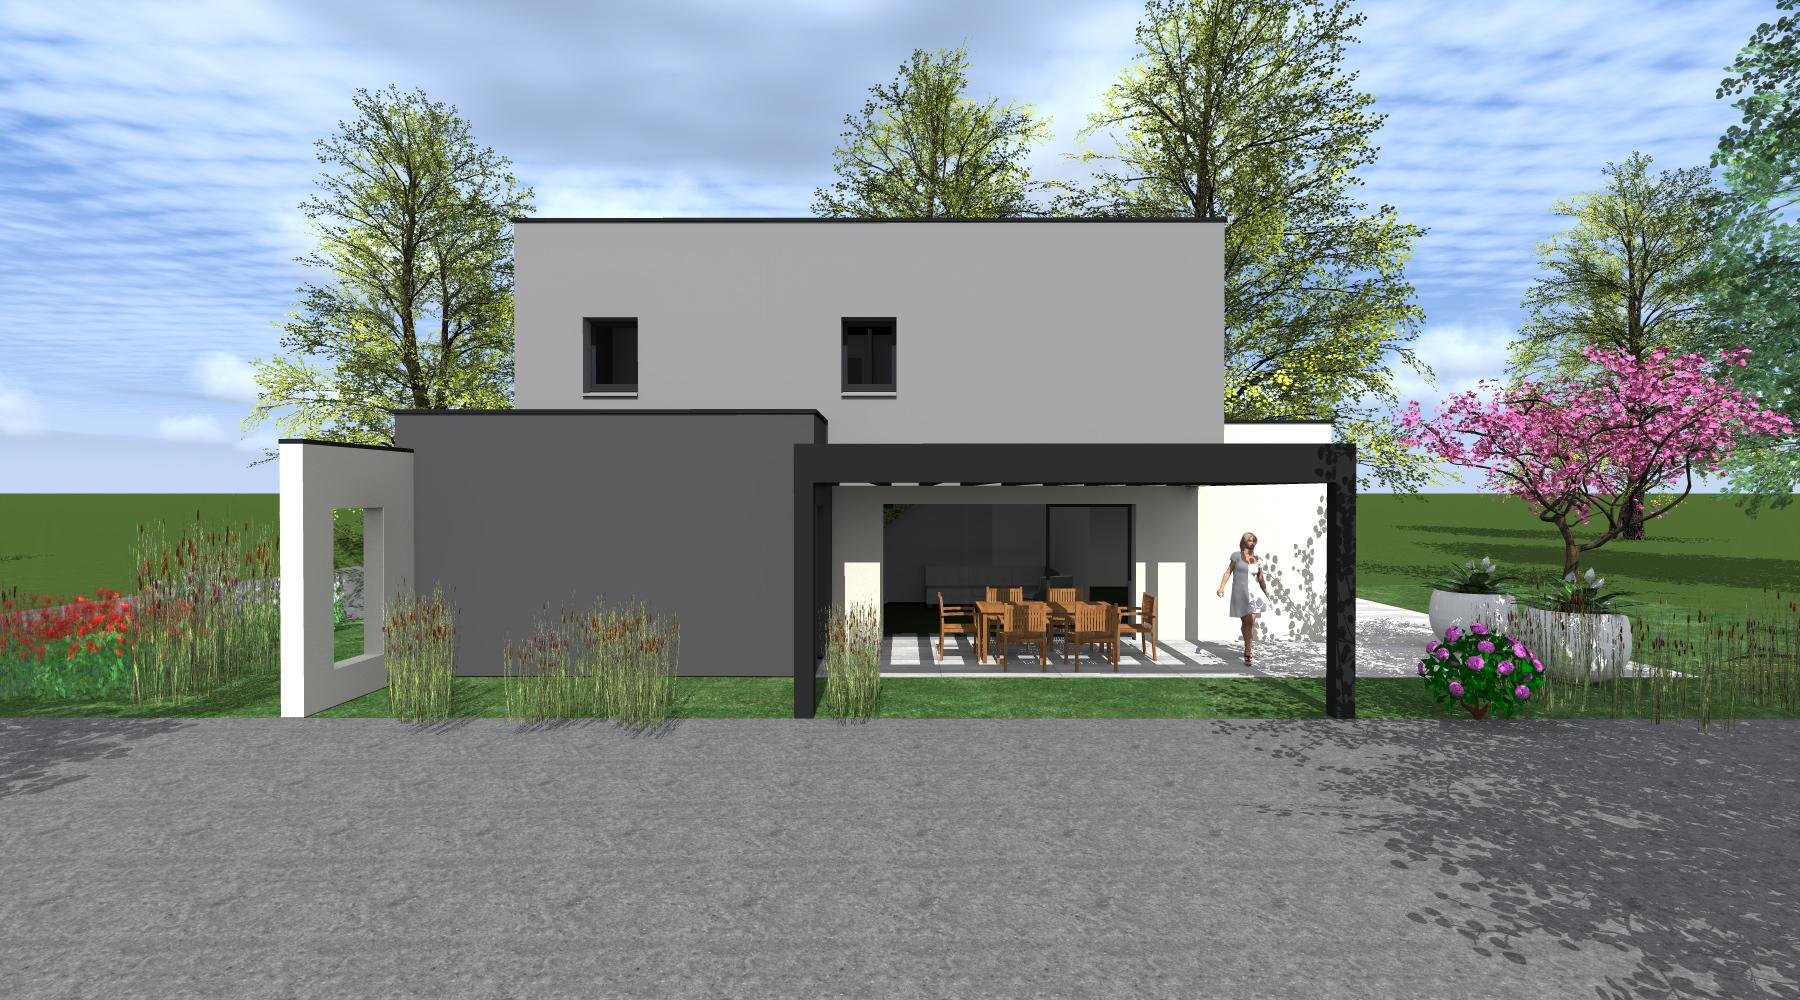 Projet m lg 1 2 vue architecte lise roturier for Maison moderne rennes